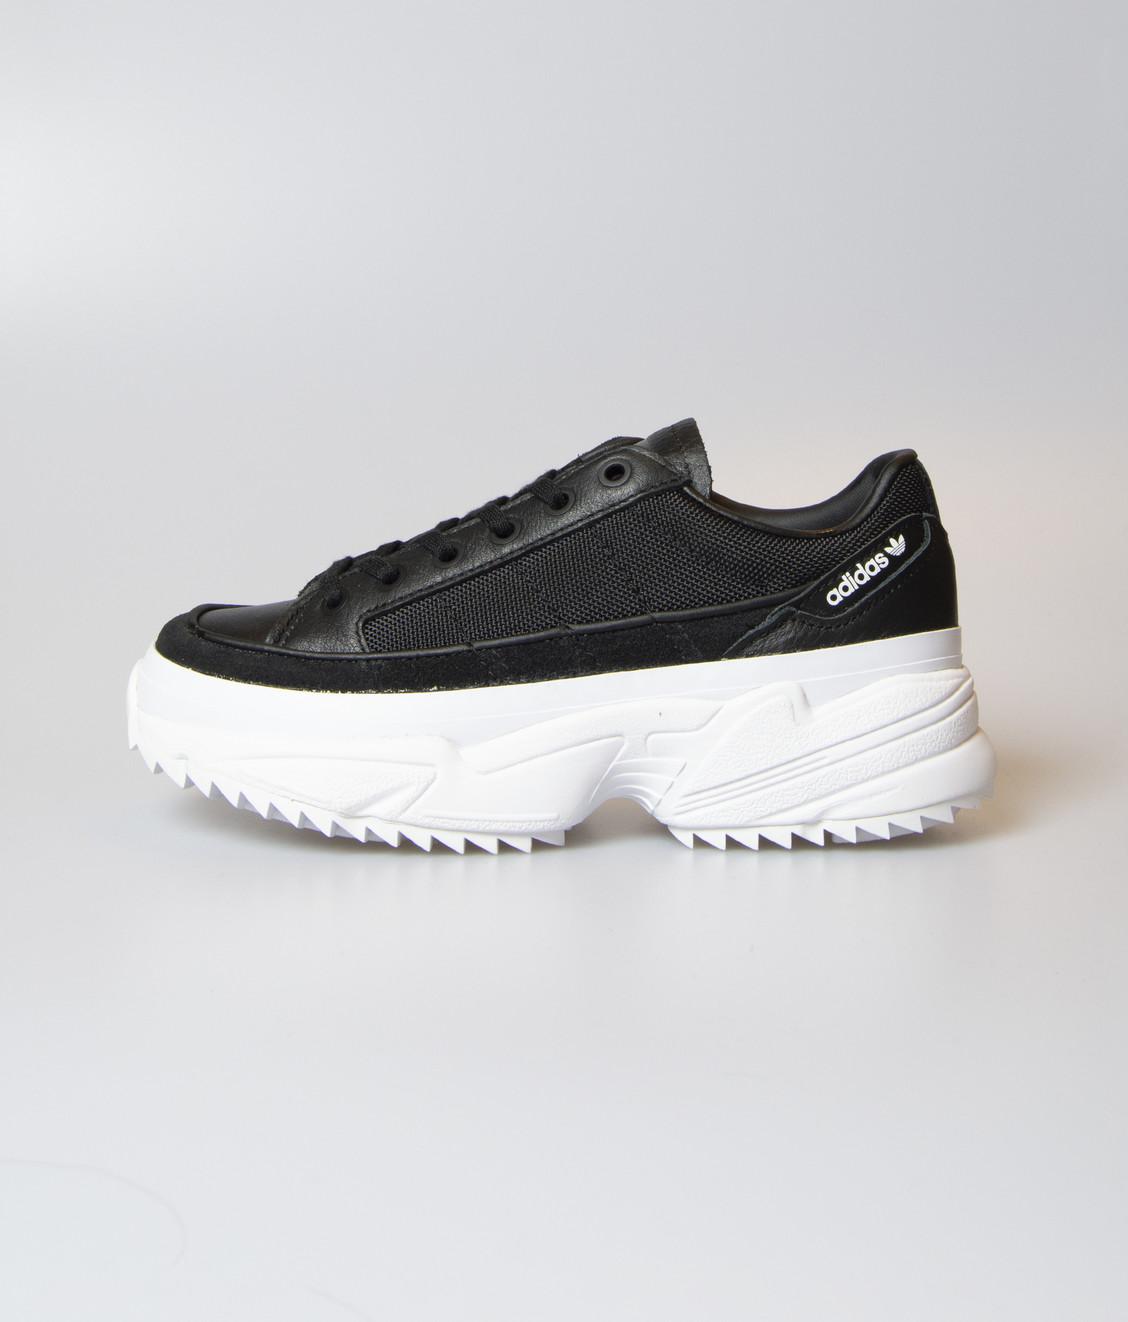 Adidas Adidas Kiellor W Black